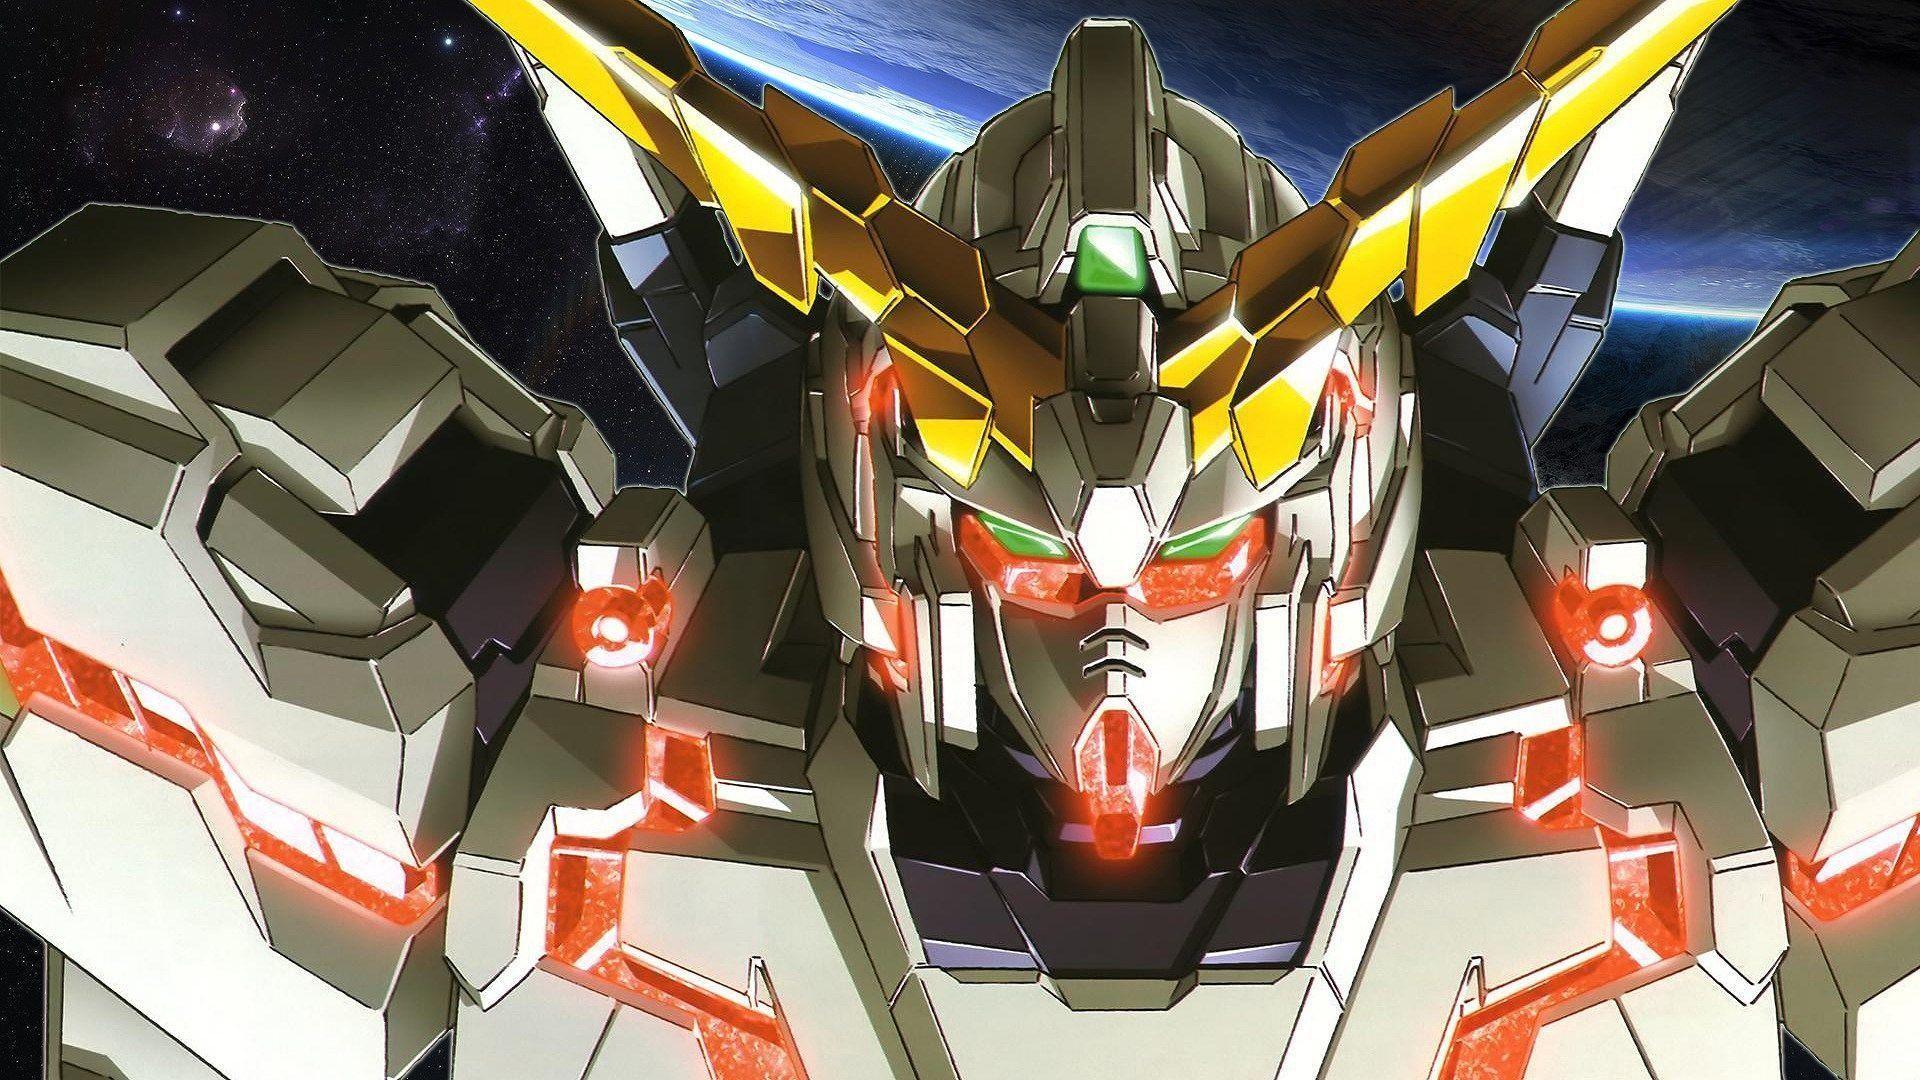 Gundam Unicorn Anime Wallpaper Wide or HD   Anime Wallpapers